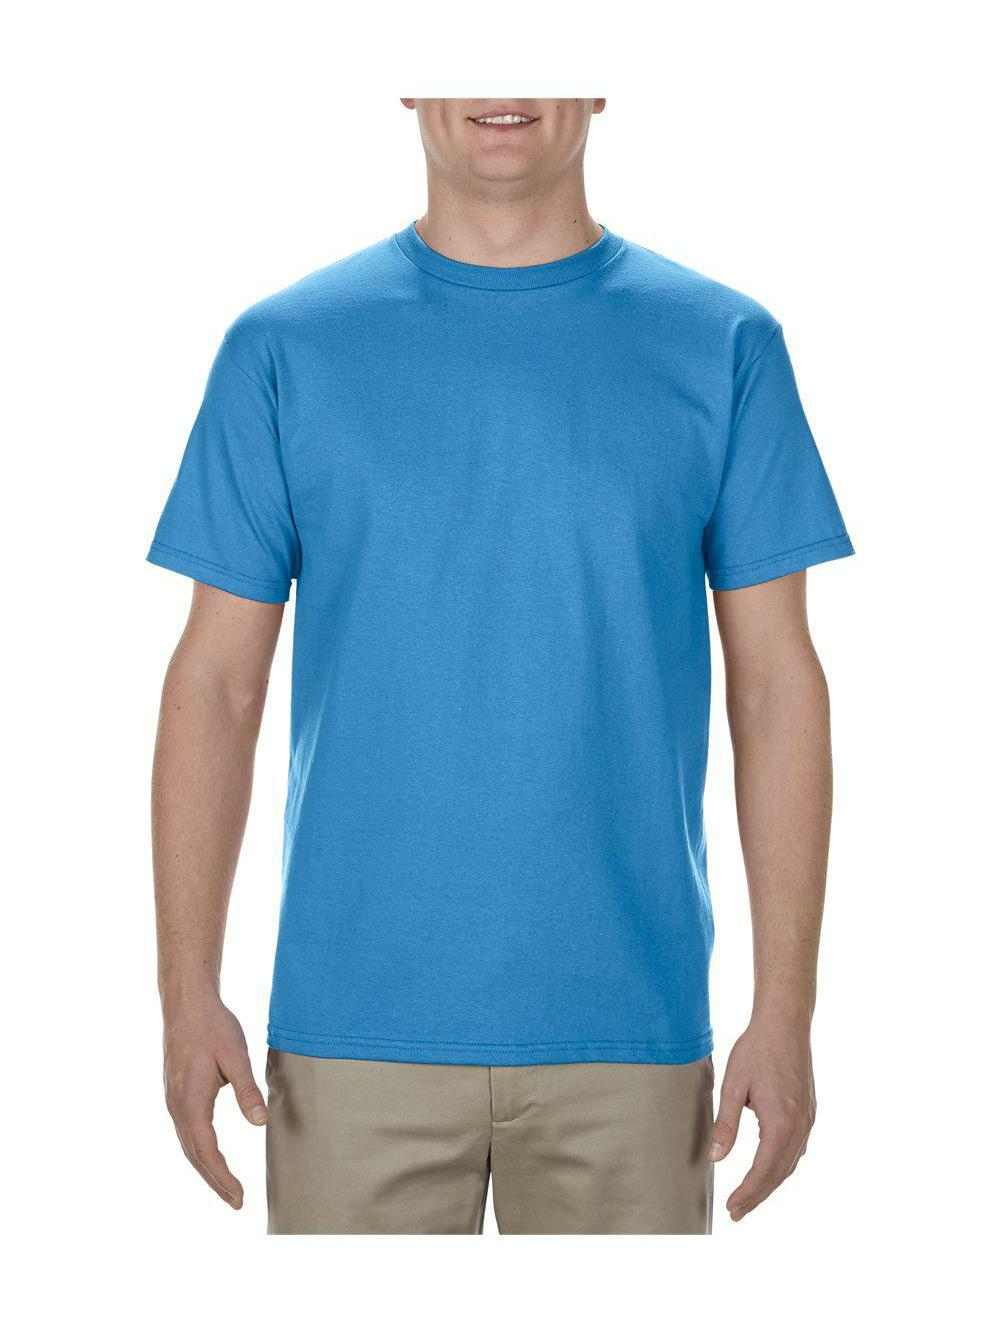 ALSTYLE-Premium-T-Shirt-1701 thumbnail 67